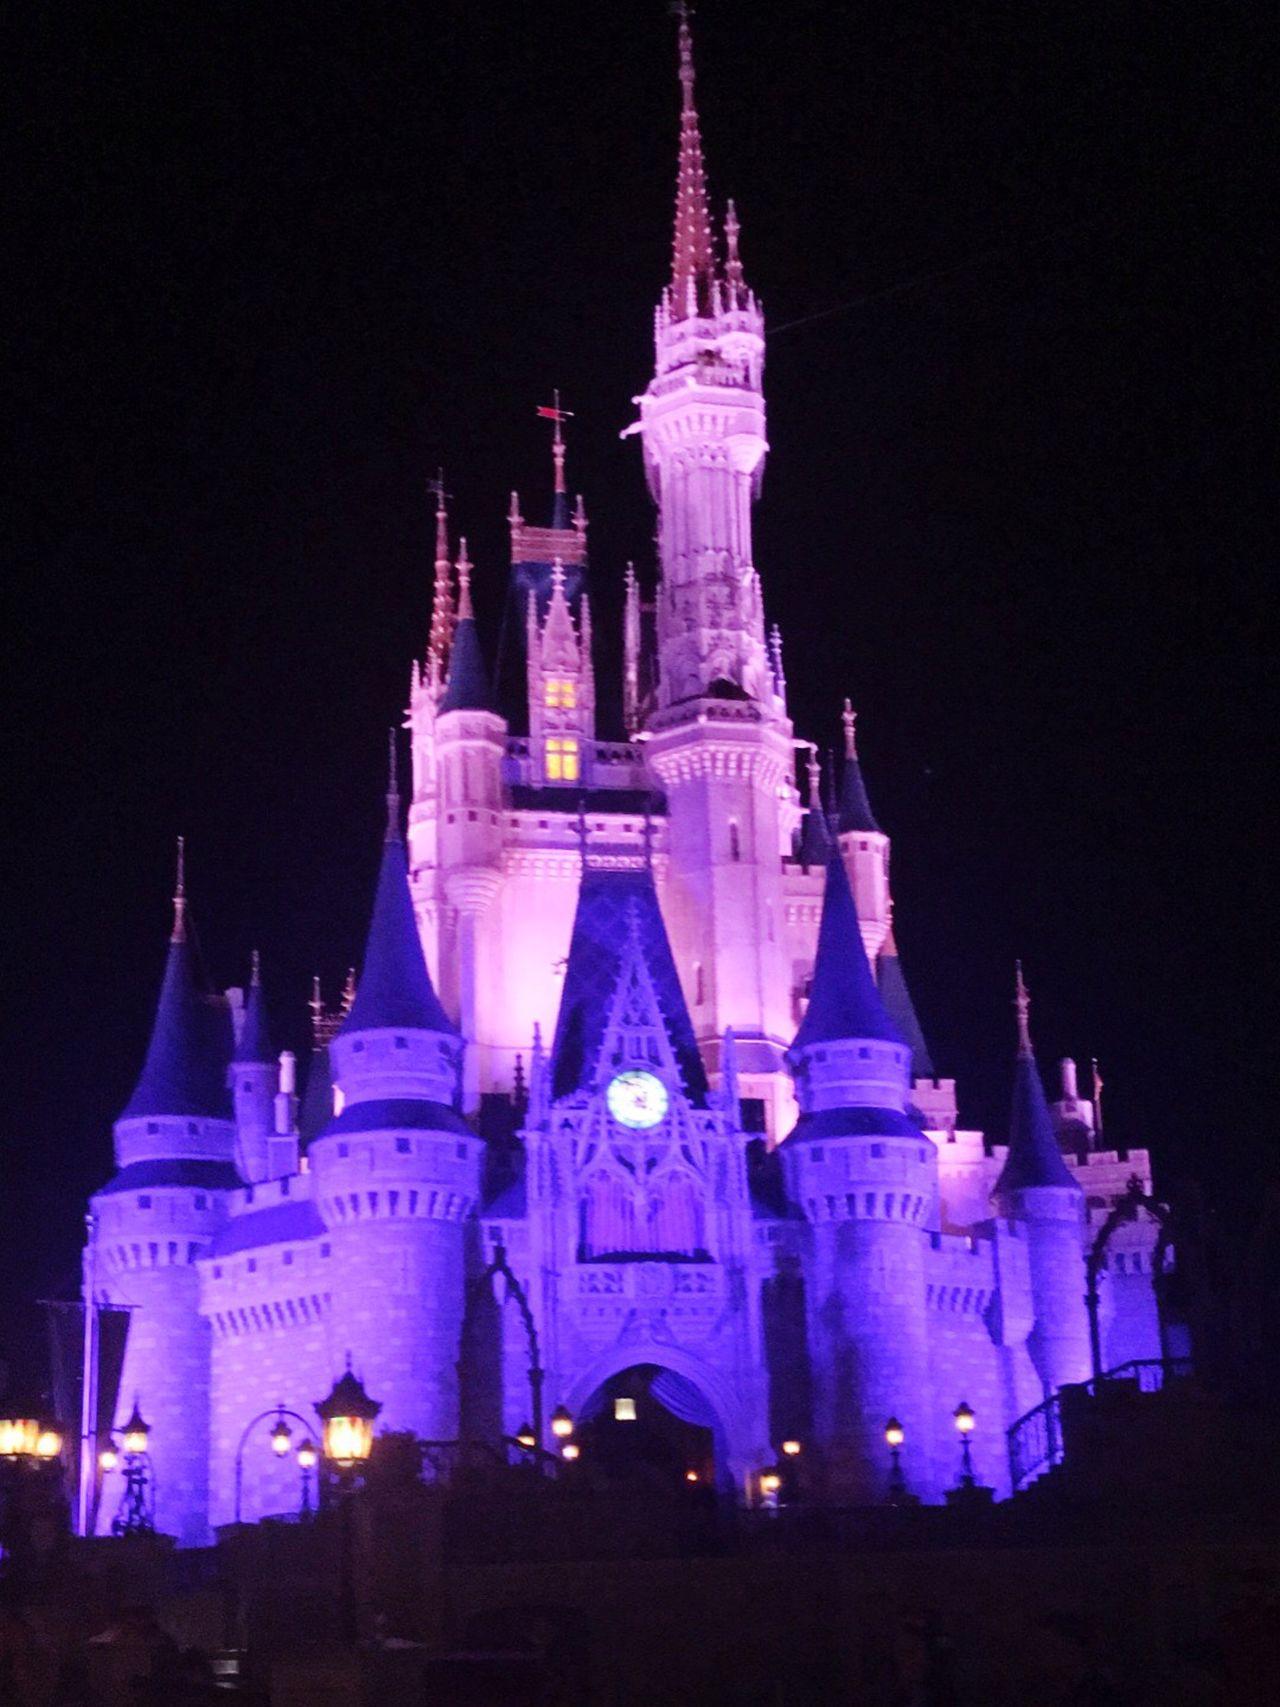 Cinderella Cinderella Castle Walt Disney World Disney DisneyWorld Magic Kingdom Night Nightphotography Travel Destinations Tourism Vacation Vacations